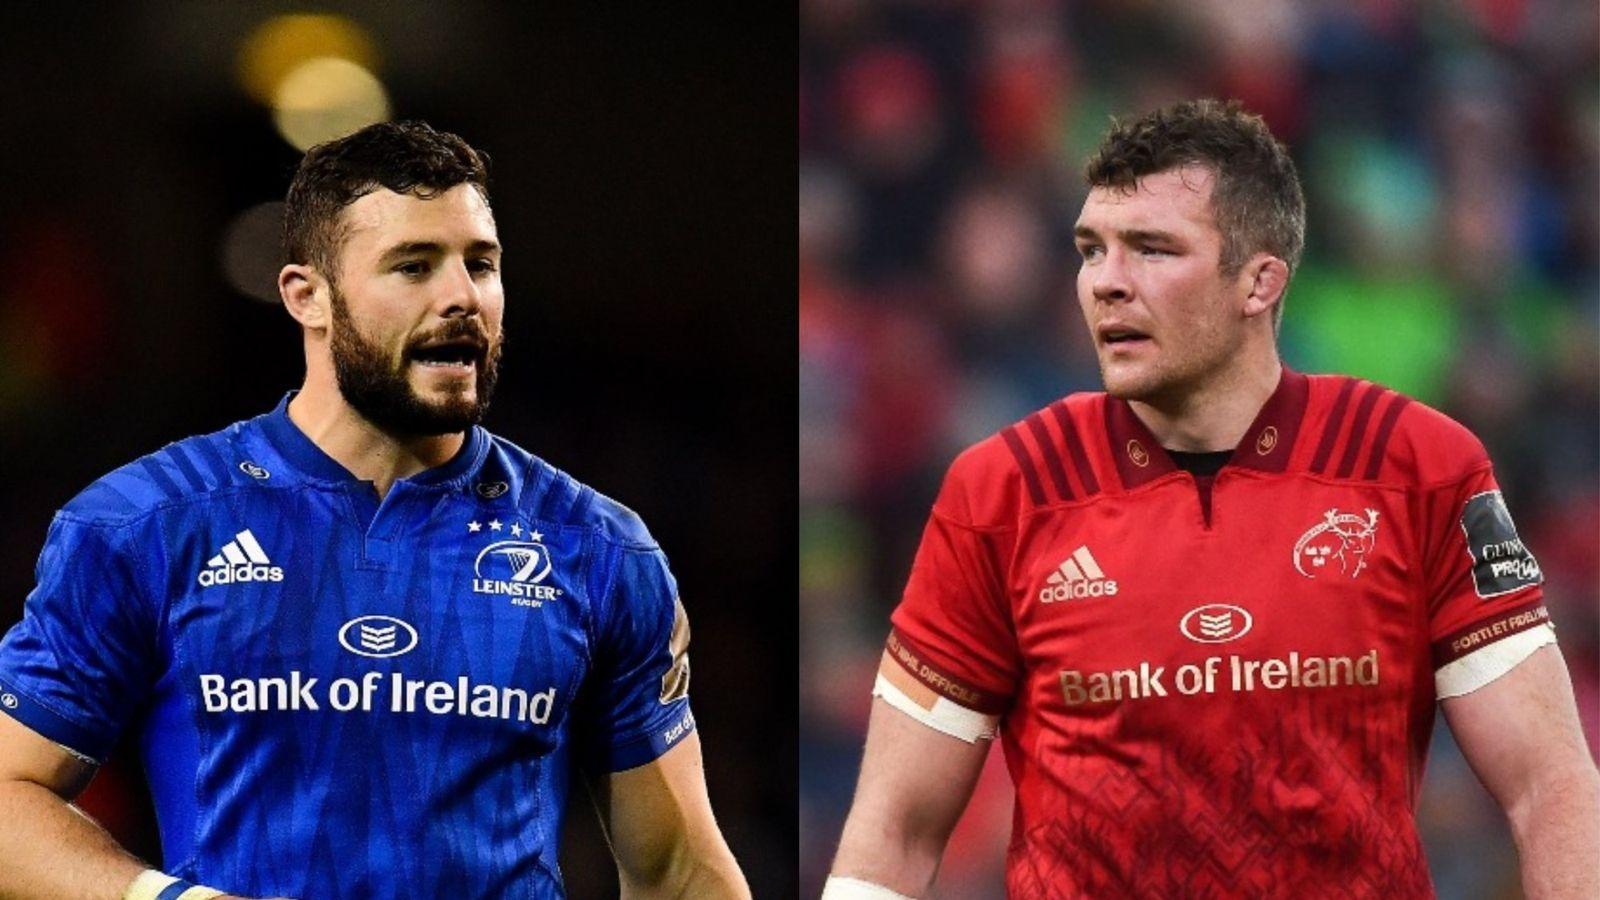 ed356d3ca Guinness PRO14 semi-final: Leinster vs Munster preview